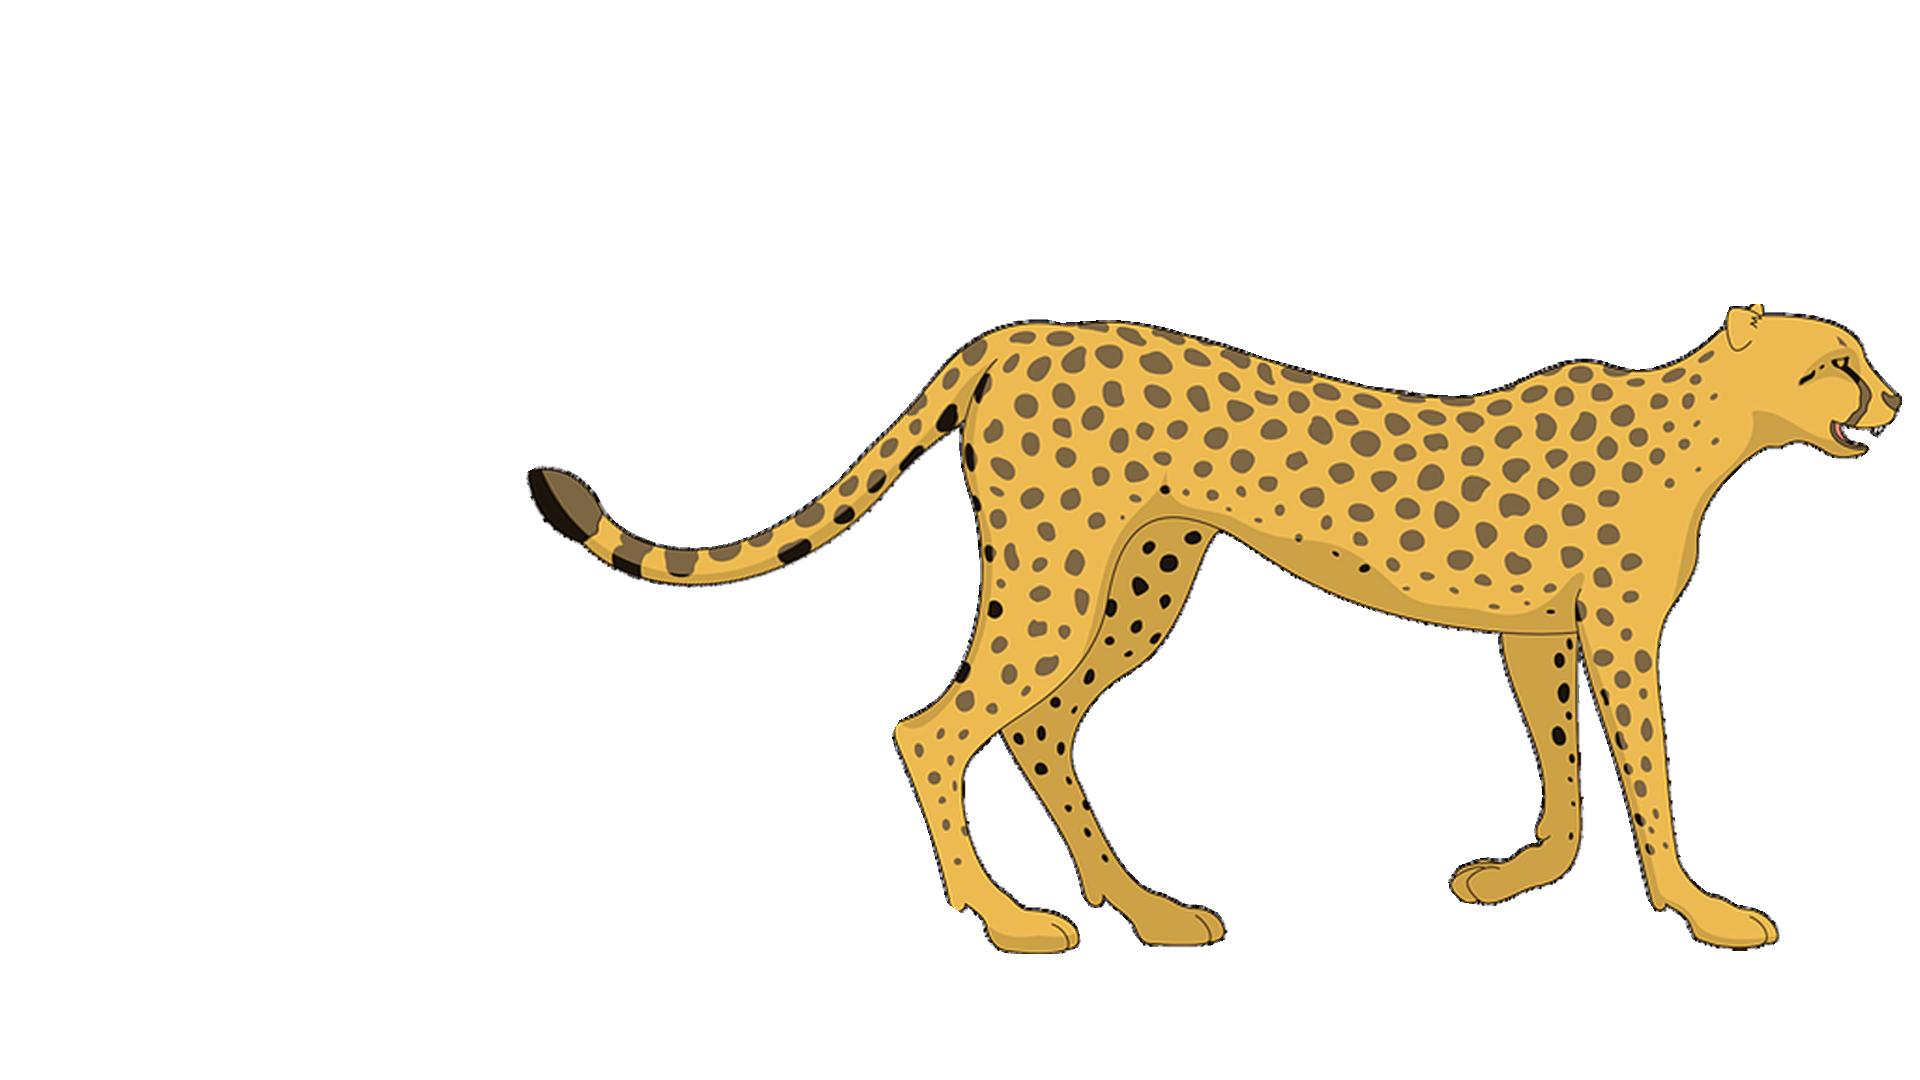 Animated Cheetah Wallpaper cheetah clipart big cat, cheetah big cat transparent free